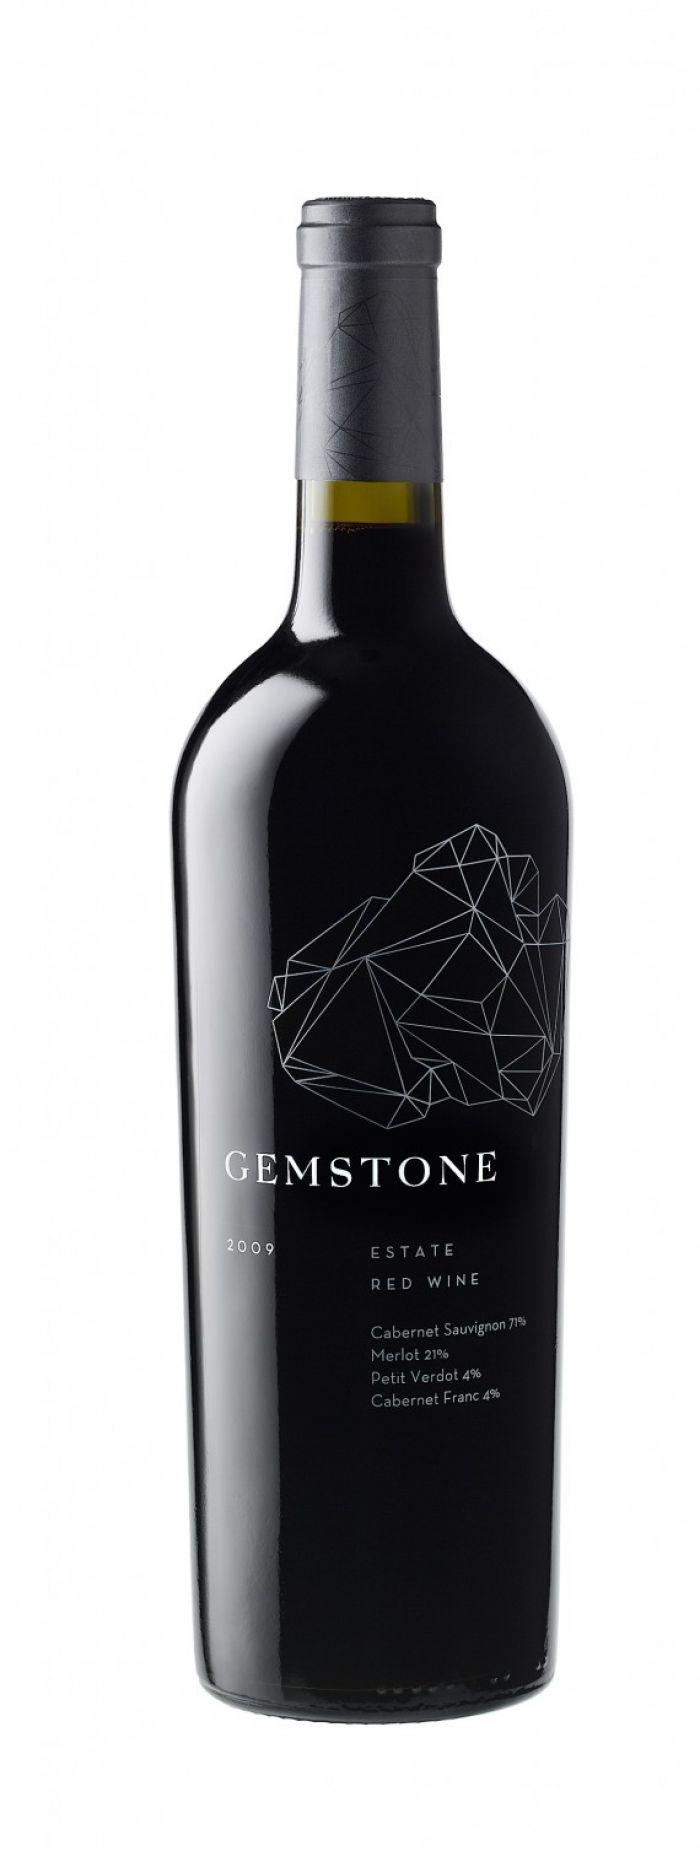 Gemstone Red